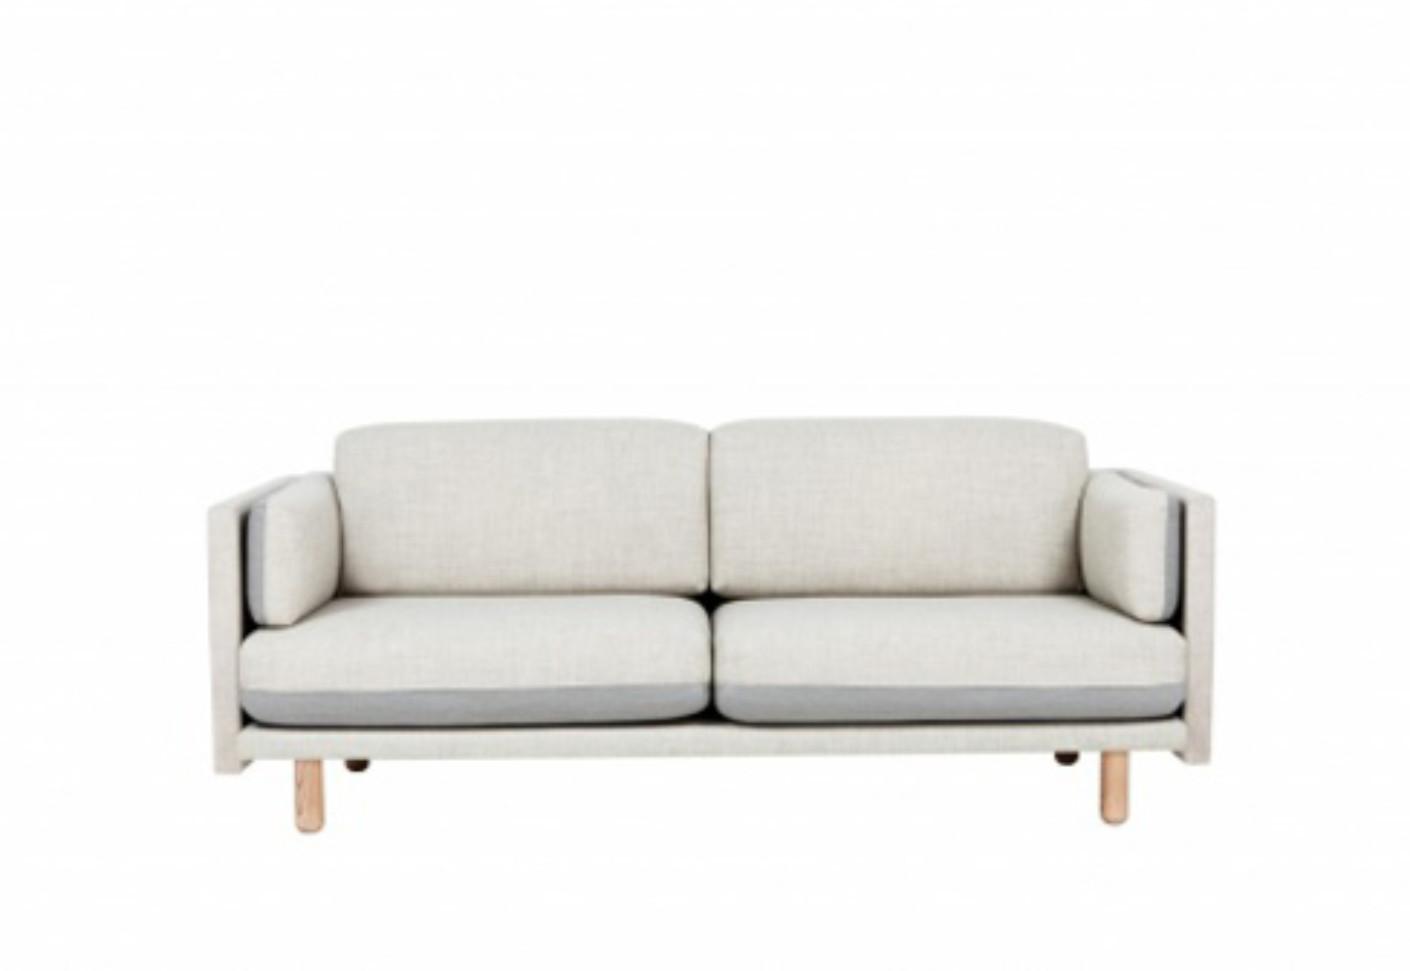 arnhem sofa von de vorm stylepark. Black Bedroom Furniture Sets. Home Design Ideas